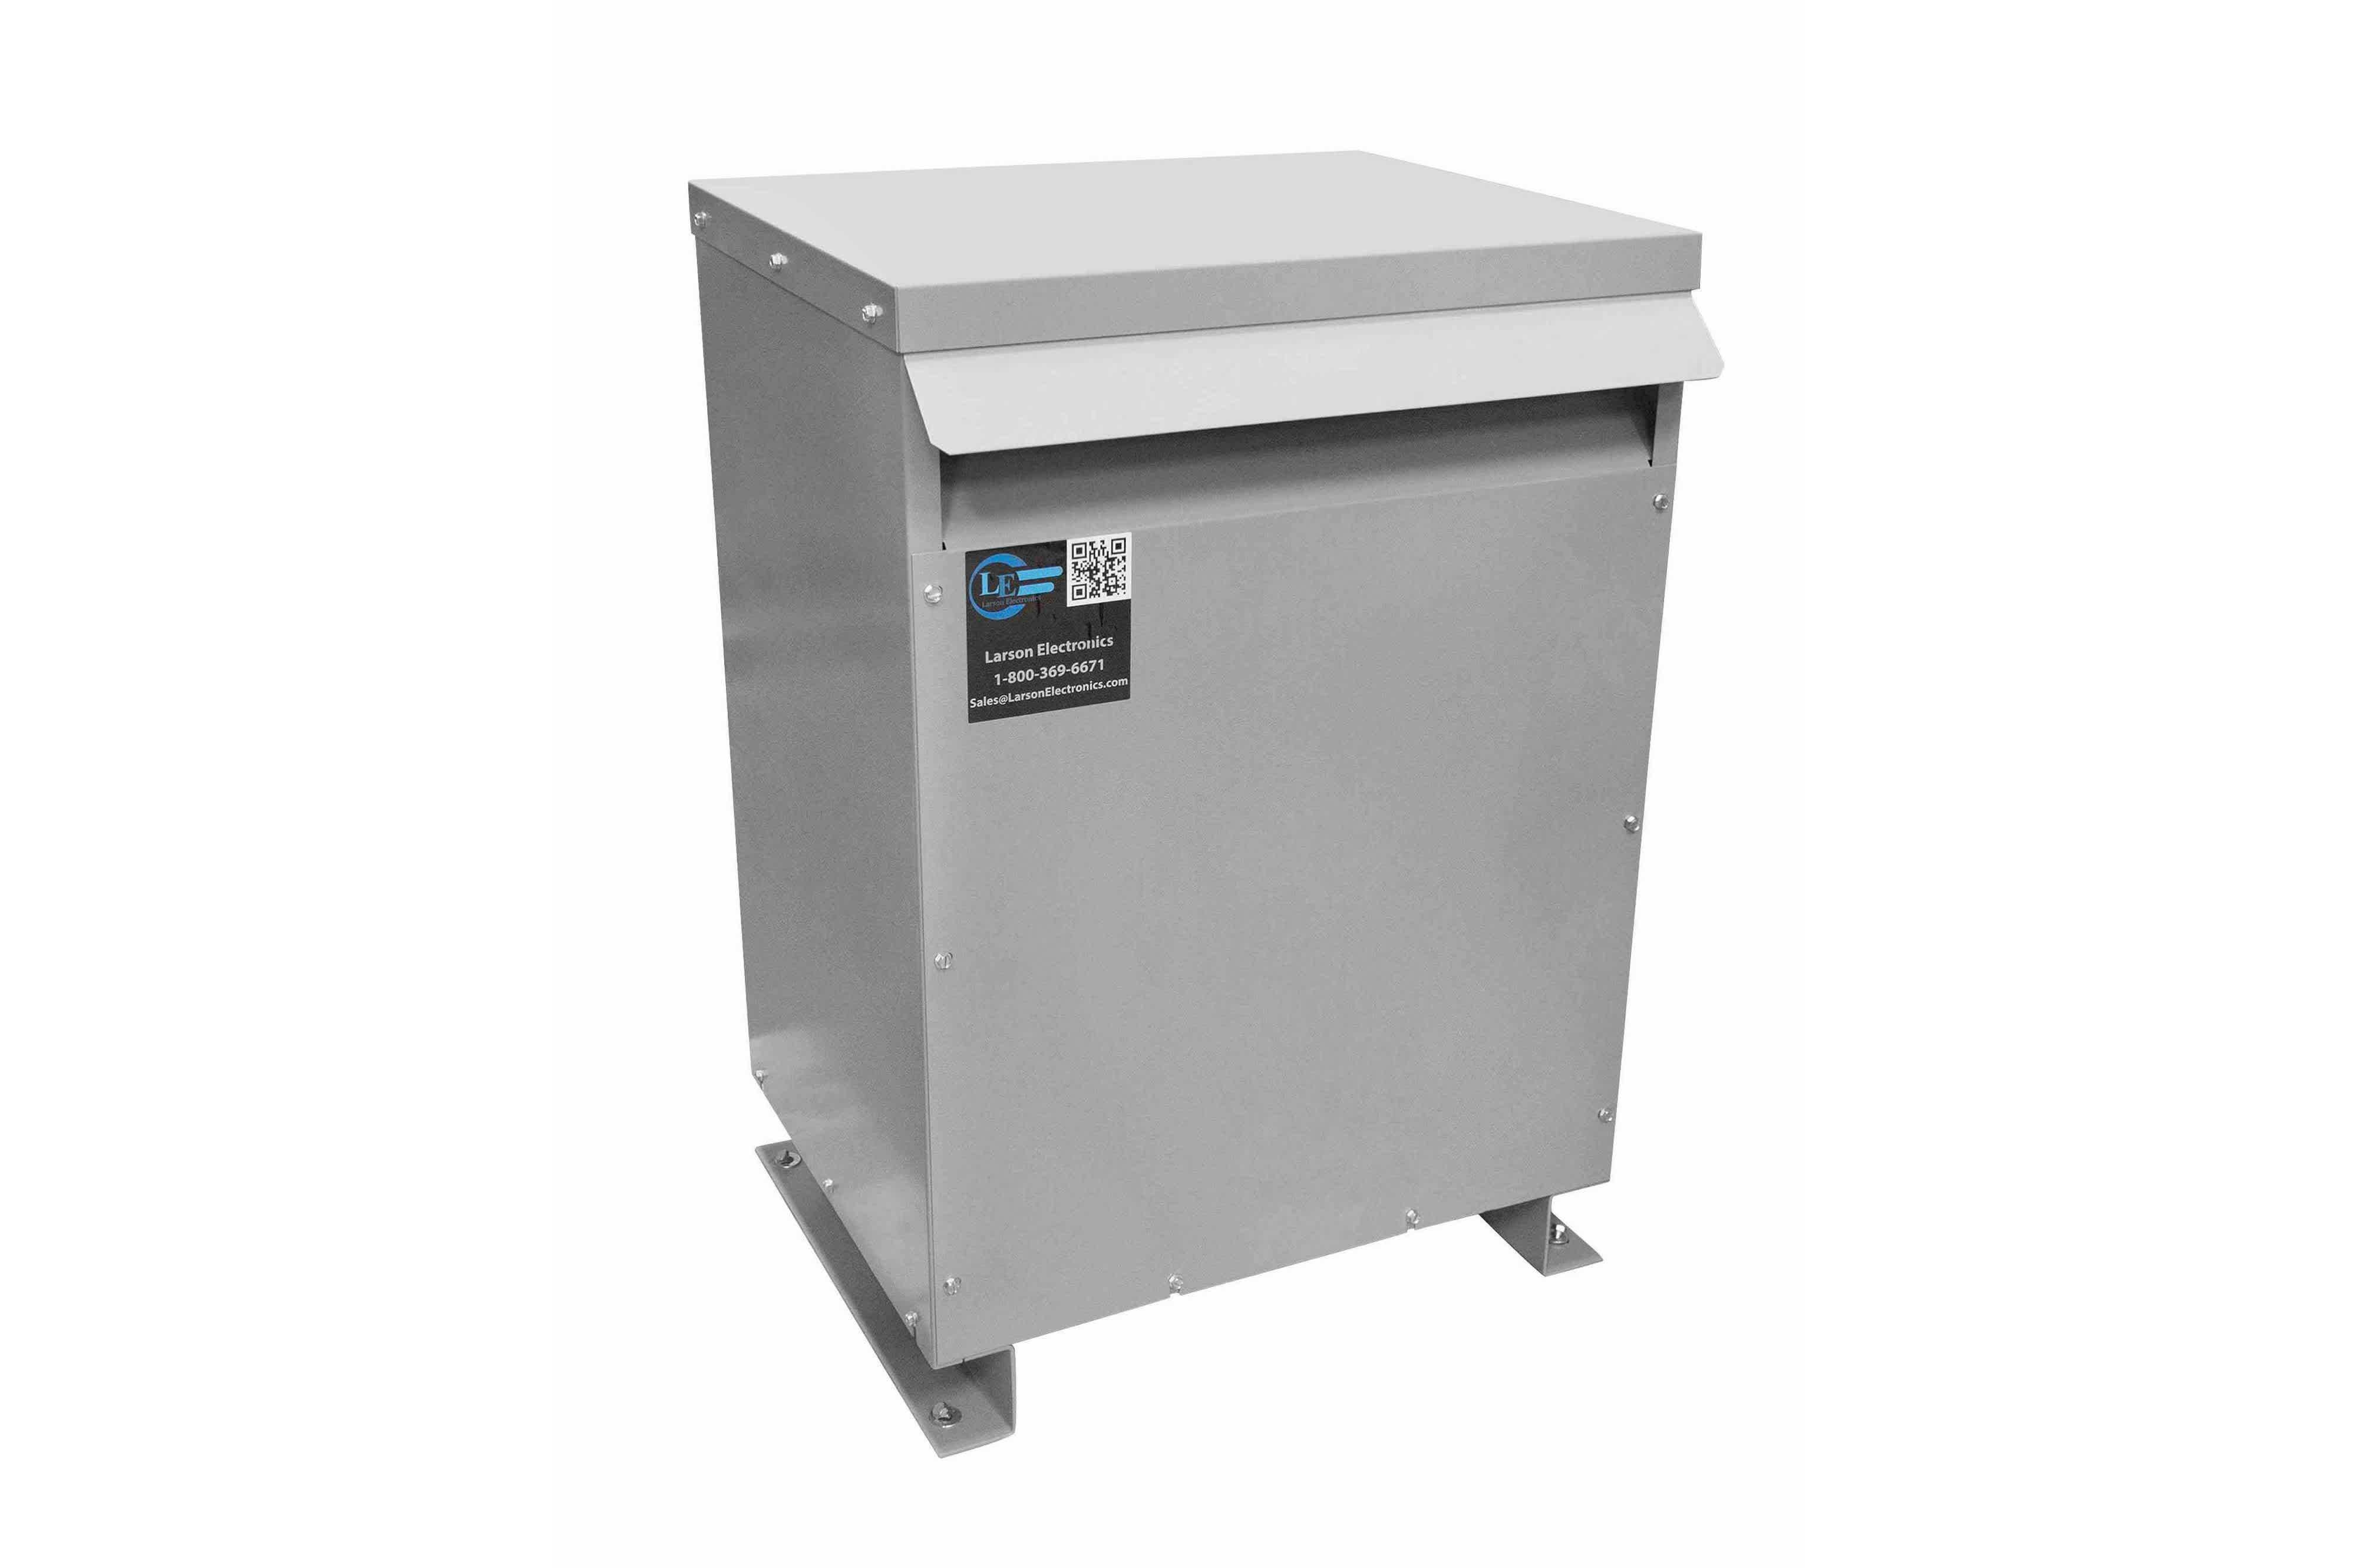 137.5 kVA 3PH Isolation Transformer, 240V Wye Primary, 600V Delta Secondary, N3R, Ventilated, 60 Hz